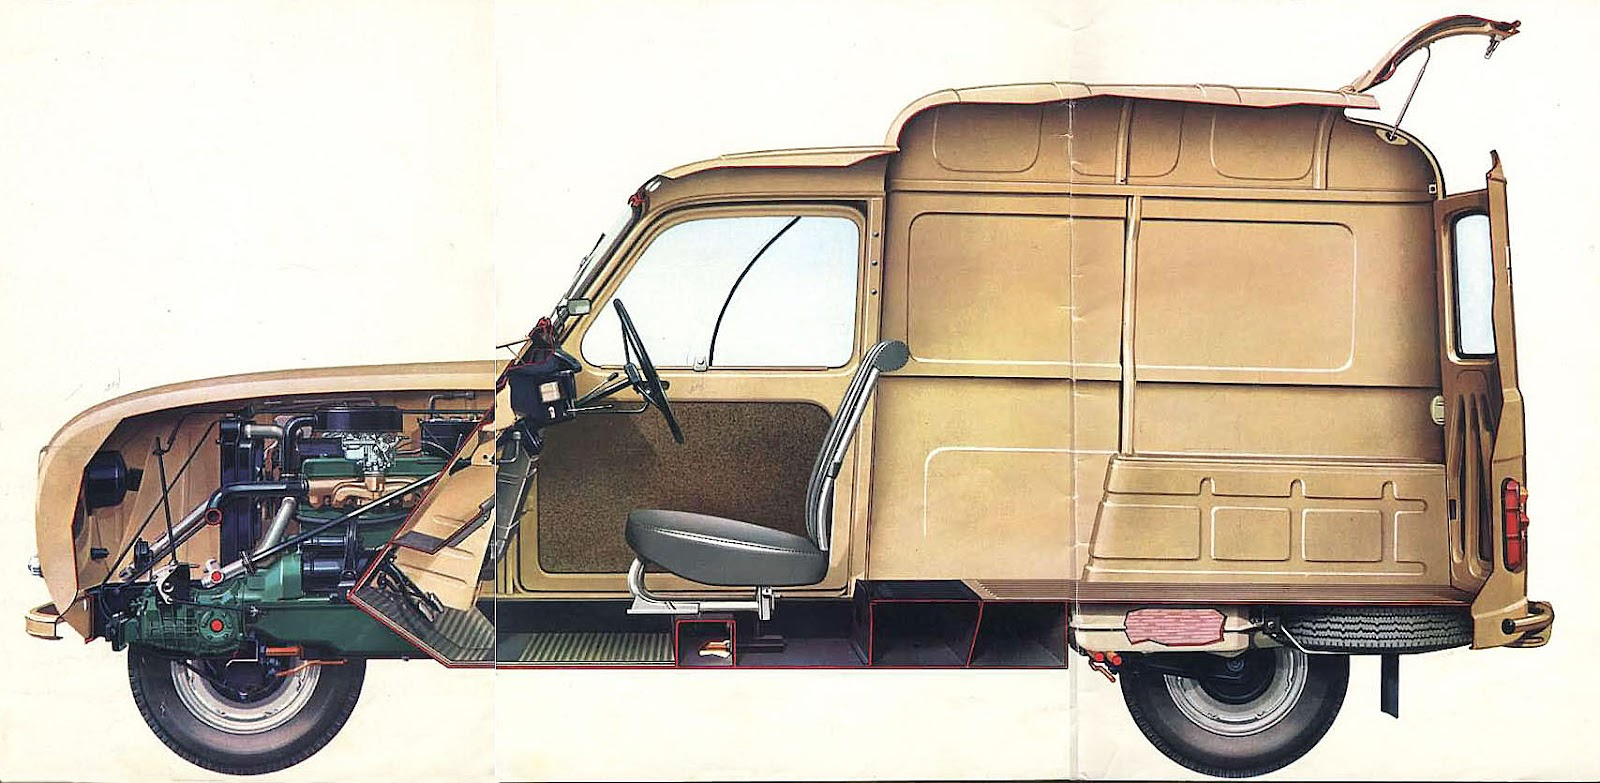 Marca renault modelo 4 fourgonnette a o 1965